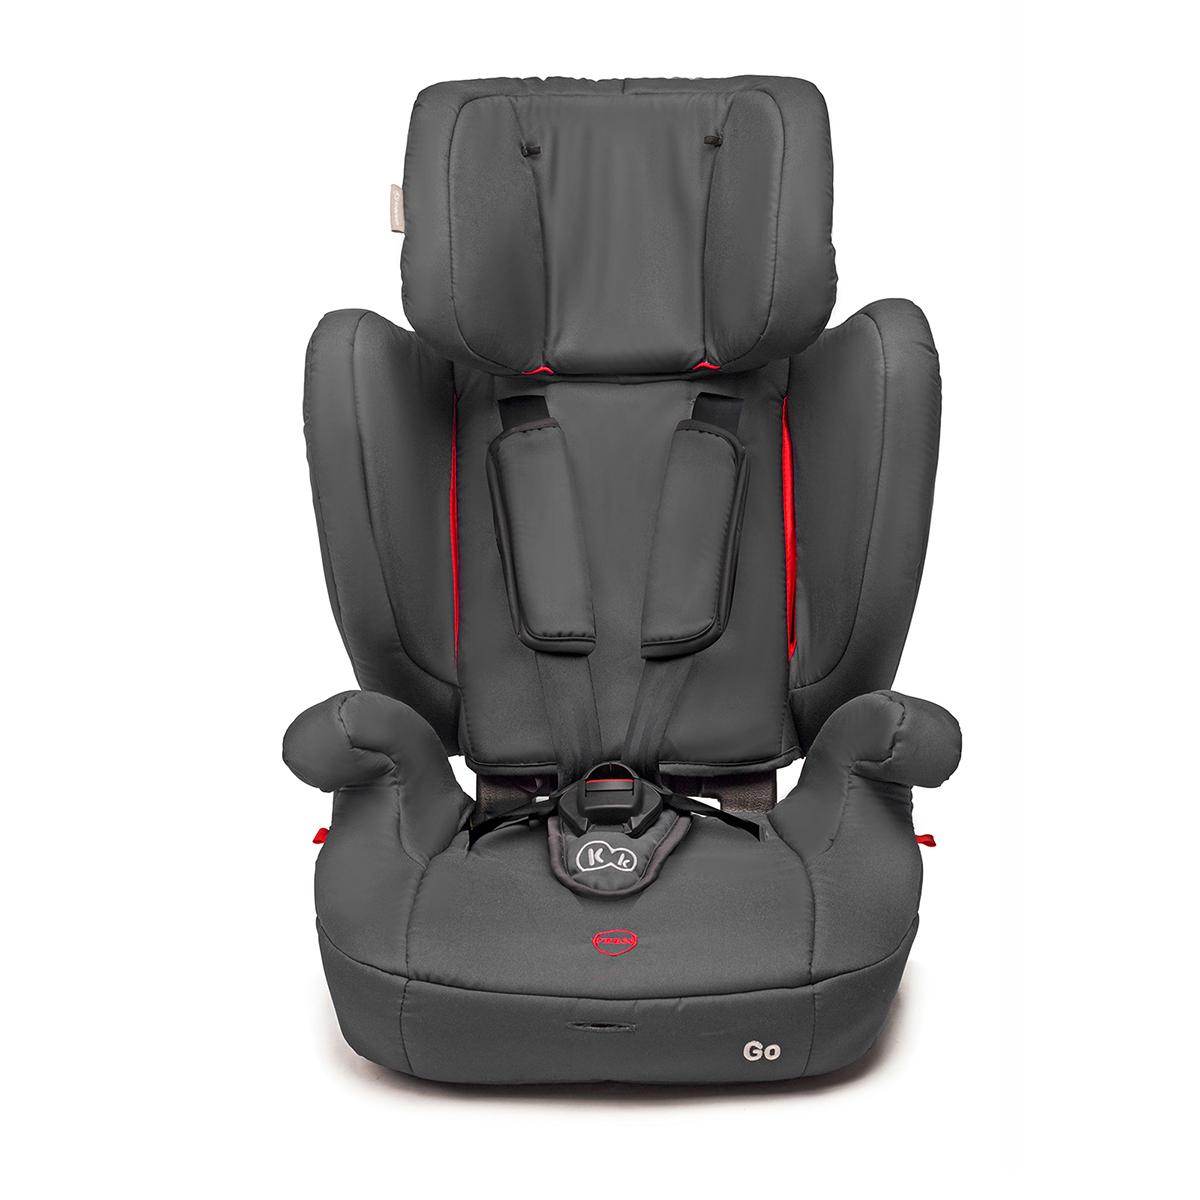 kinderkraft go kinderautositz autositz kindersitz 9 bis 36. Black Bedroom Furniture Sets. Home Design Ideas